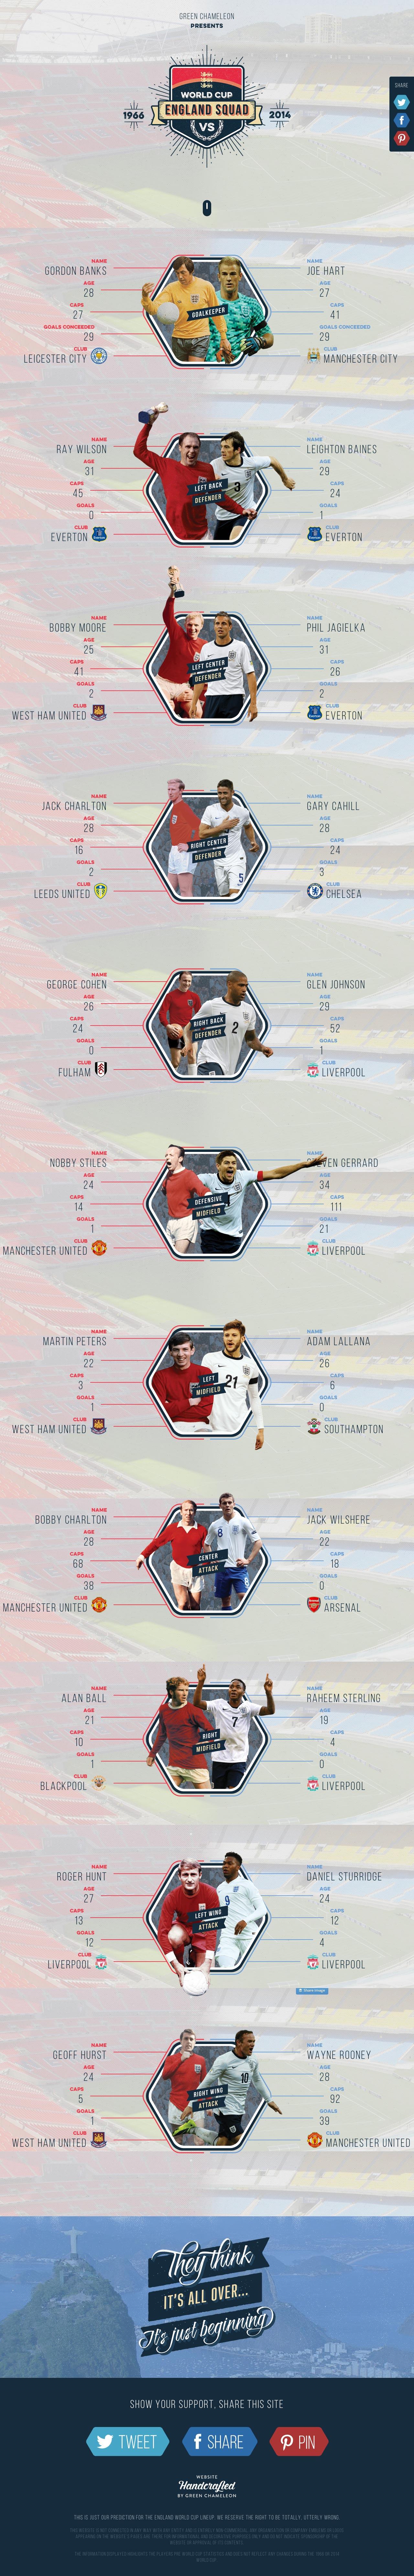 England's World Cup Squad – 1966 vs 2014 Website Screenshot